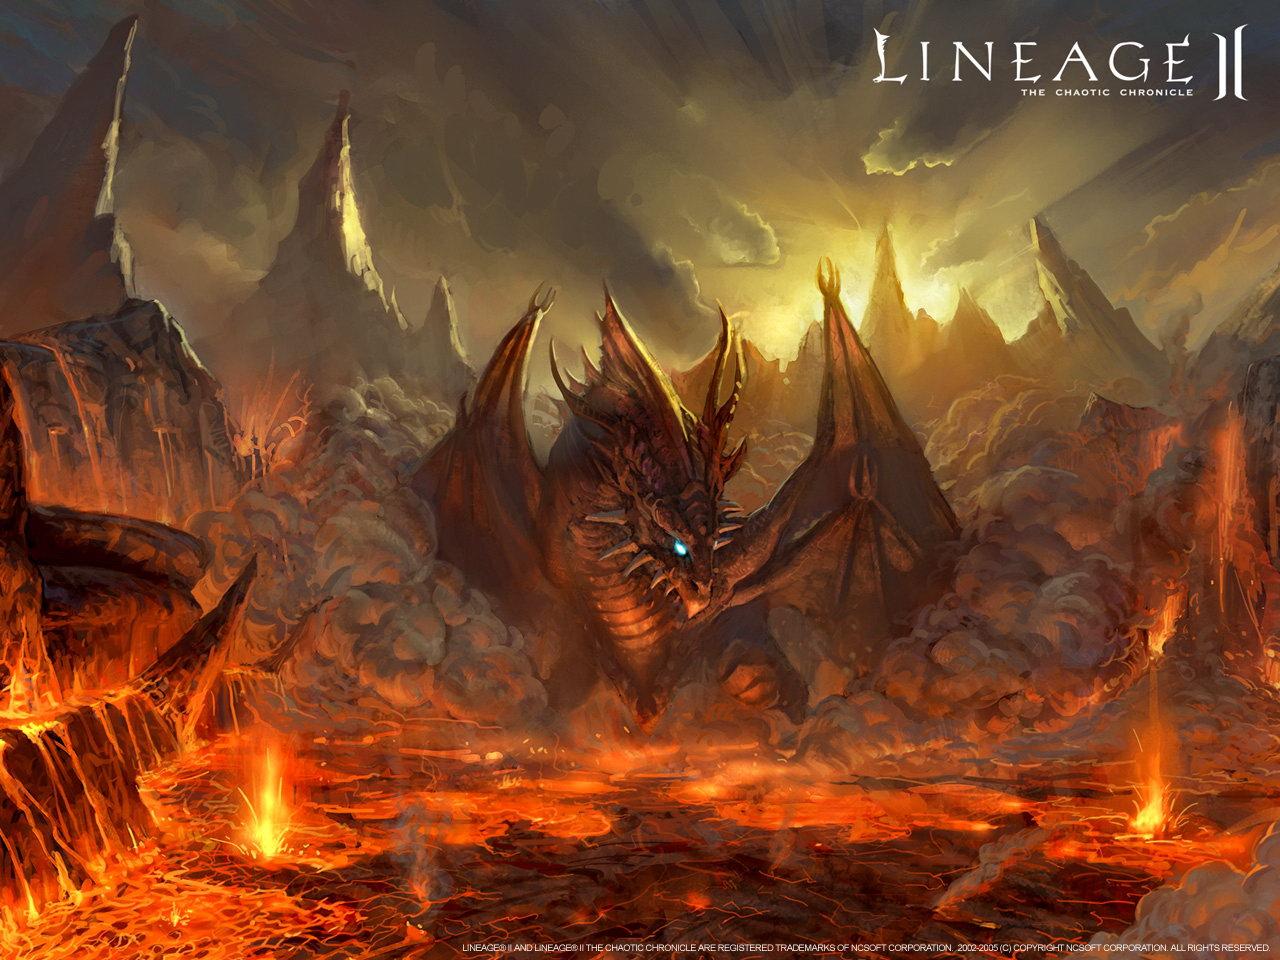 http://2.bp.blogspot.com/_cc1yONIZGoI/TBjVrSwy5mI/AAAAAAAAA6g/jyUSAMmTYv4/s1600/Dragon-Wallpaper-dragons-542617_1280_960.jpg